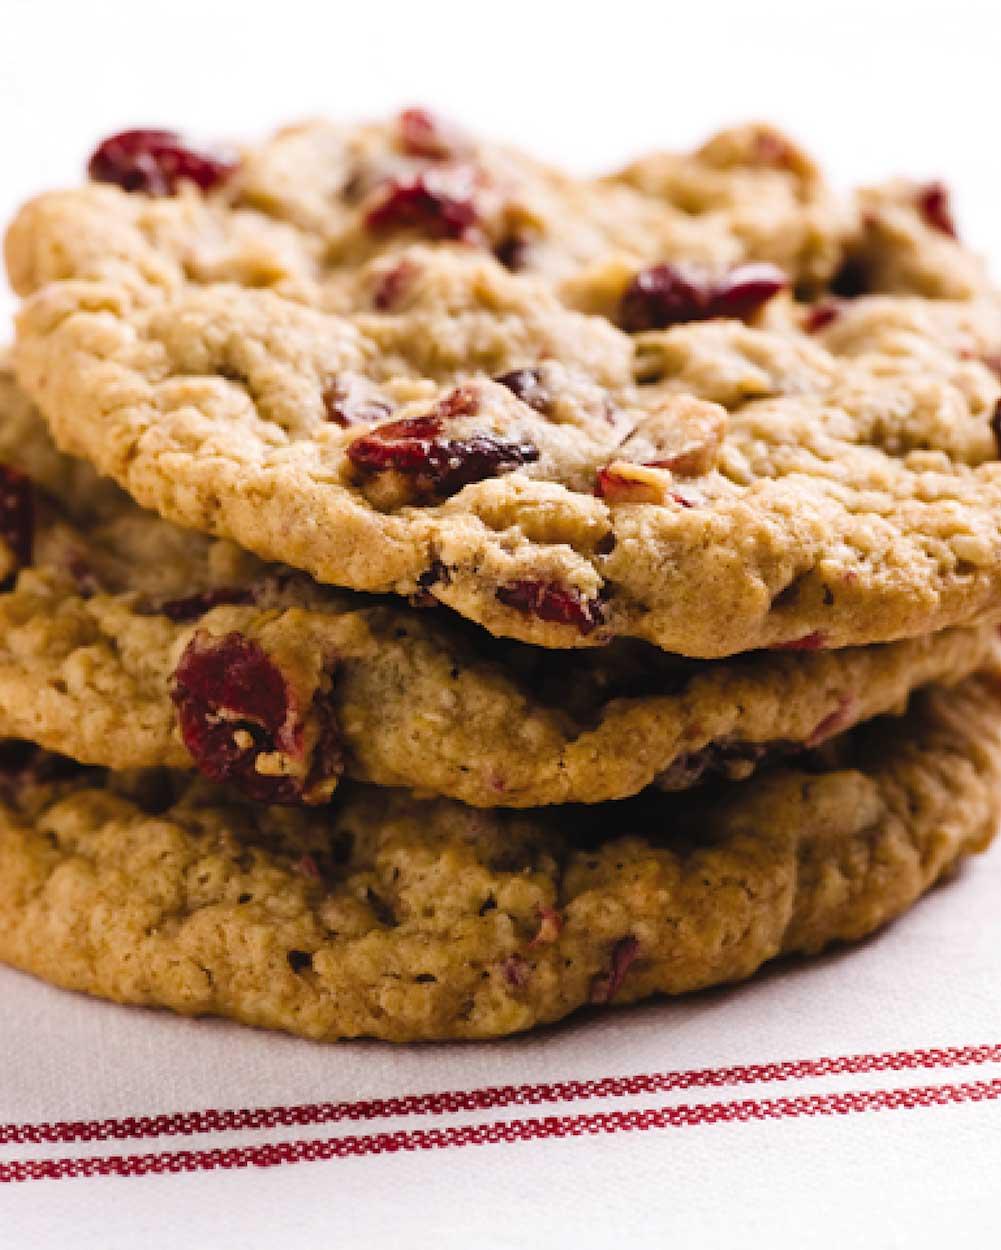 Cinnamon-Sugar Glazed Oatmeal Cookies Recipe - Seaside Market